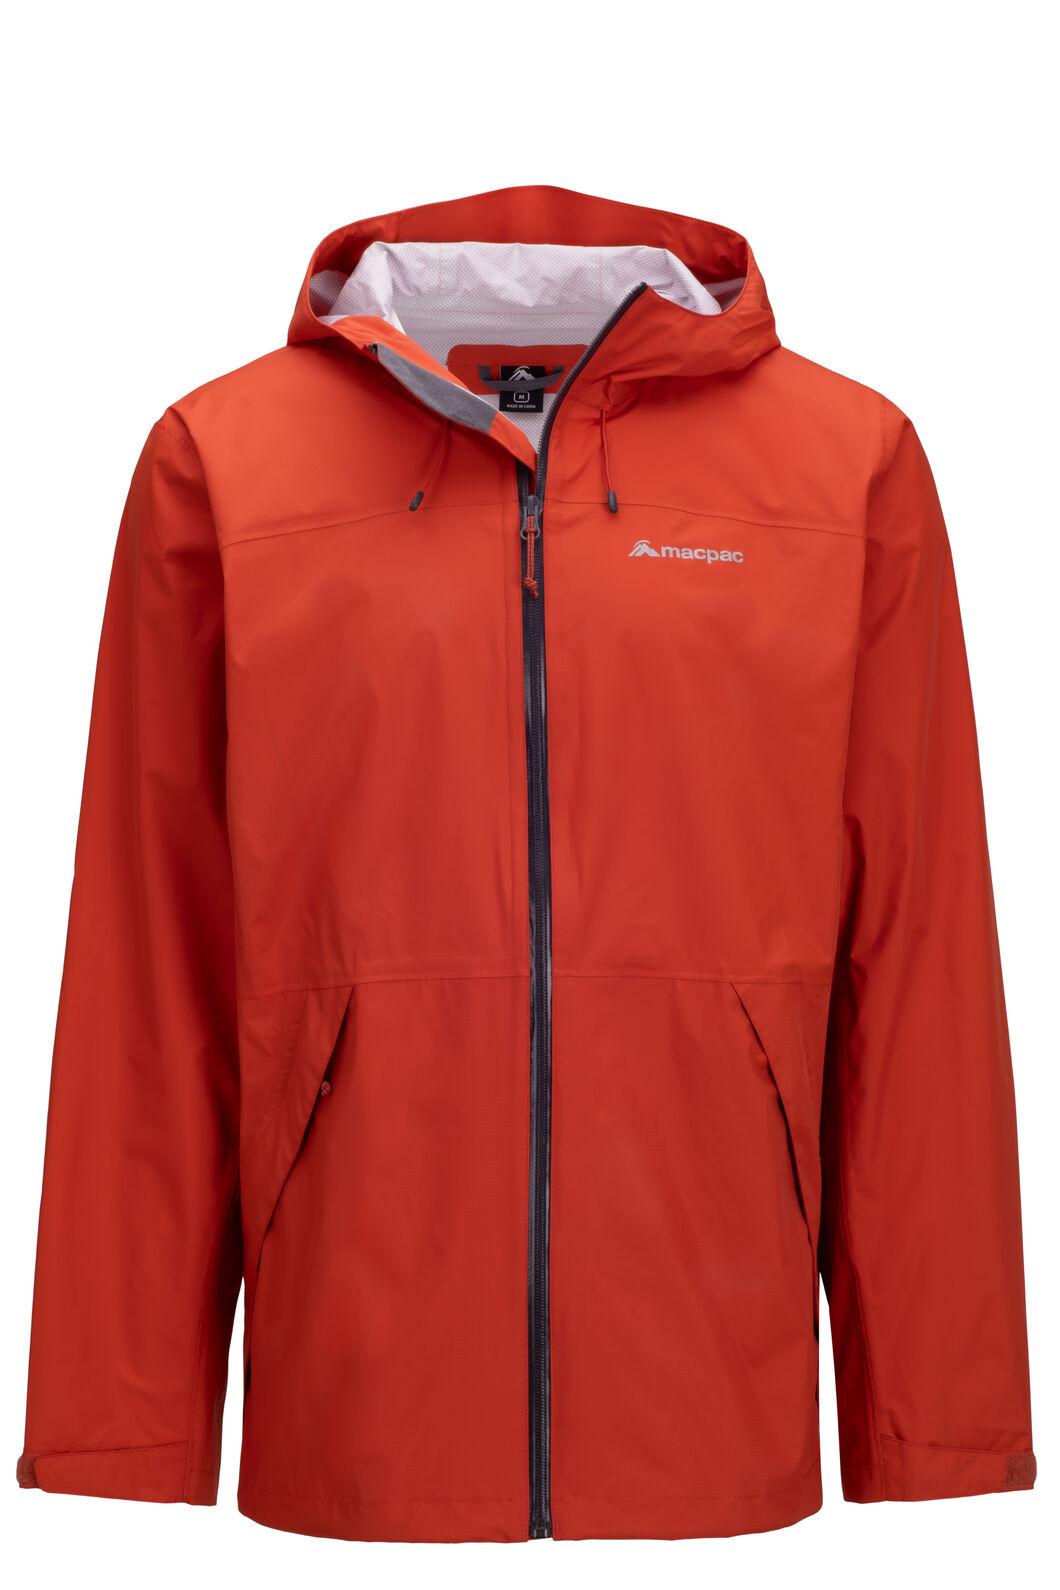 Macpac Men's Mistral Rain Jacket, Burnt Ochre, hi-res